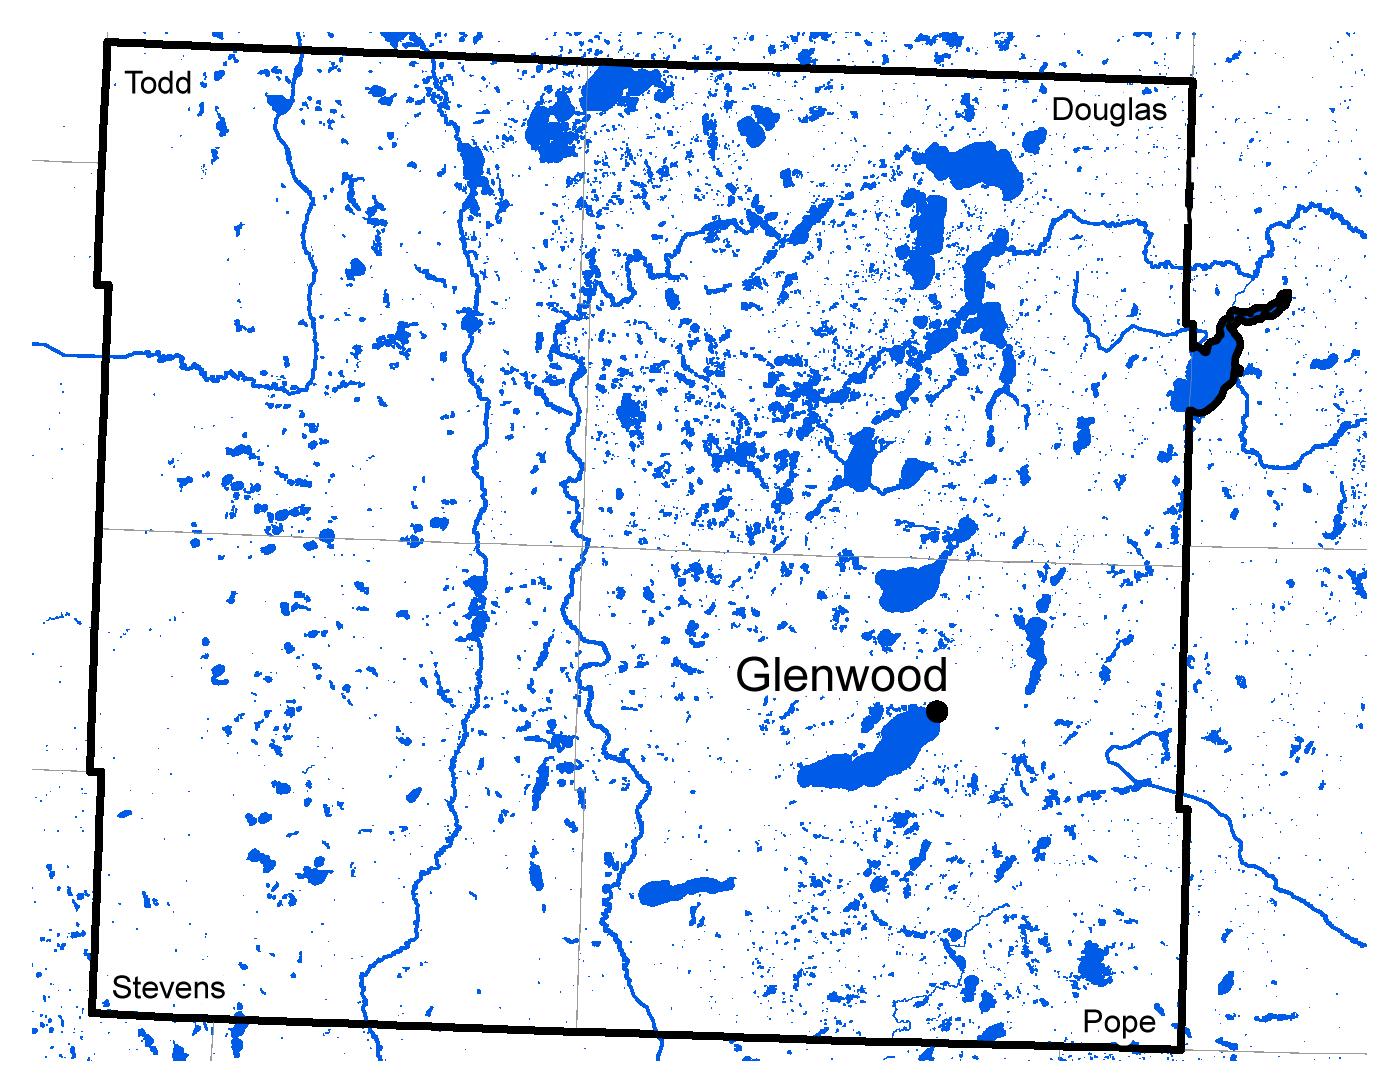 Map of Glenwood work area